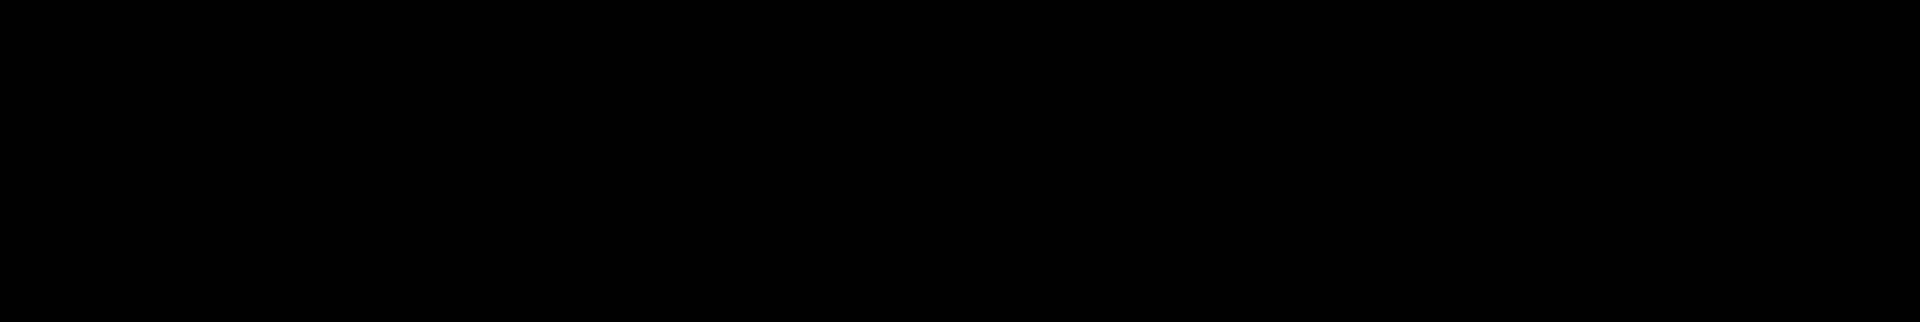 Crescent Home Buyers  logo